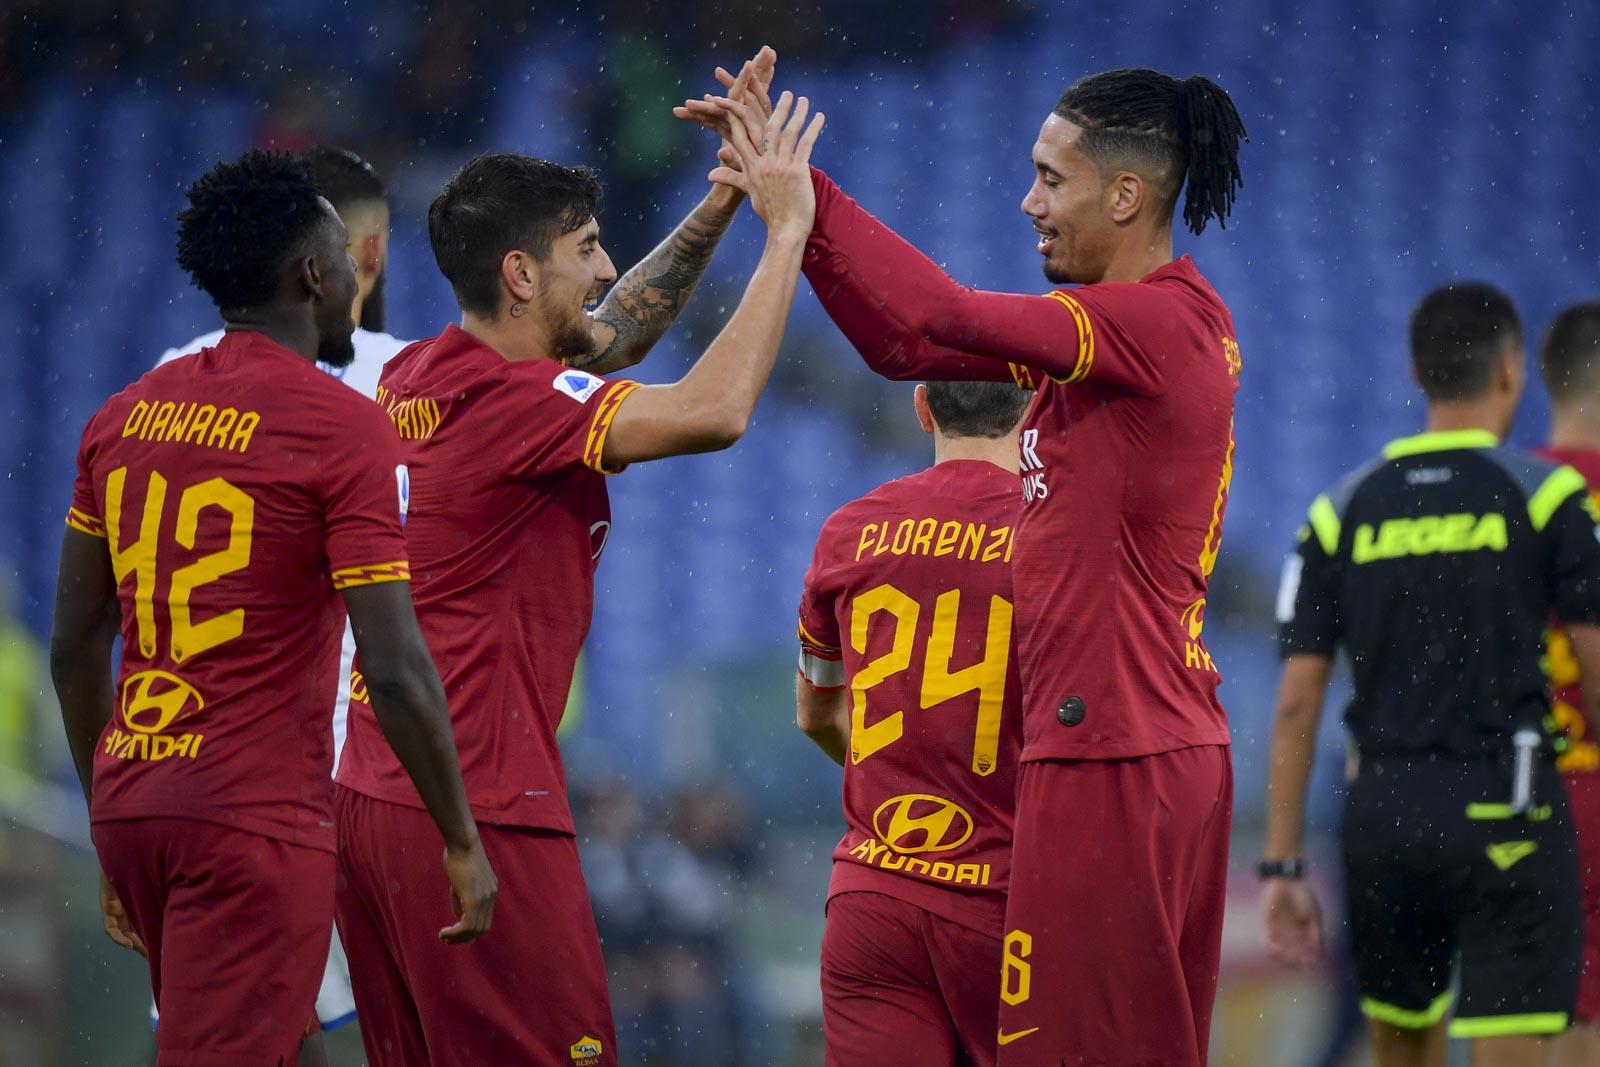 https: img.okezone.com content 2019 11 24 47 2133903 as-roma-bungkam-brescia-tiga-gol-tanpa-balas-XlBVL7nAFb.jpg